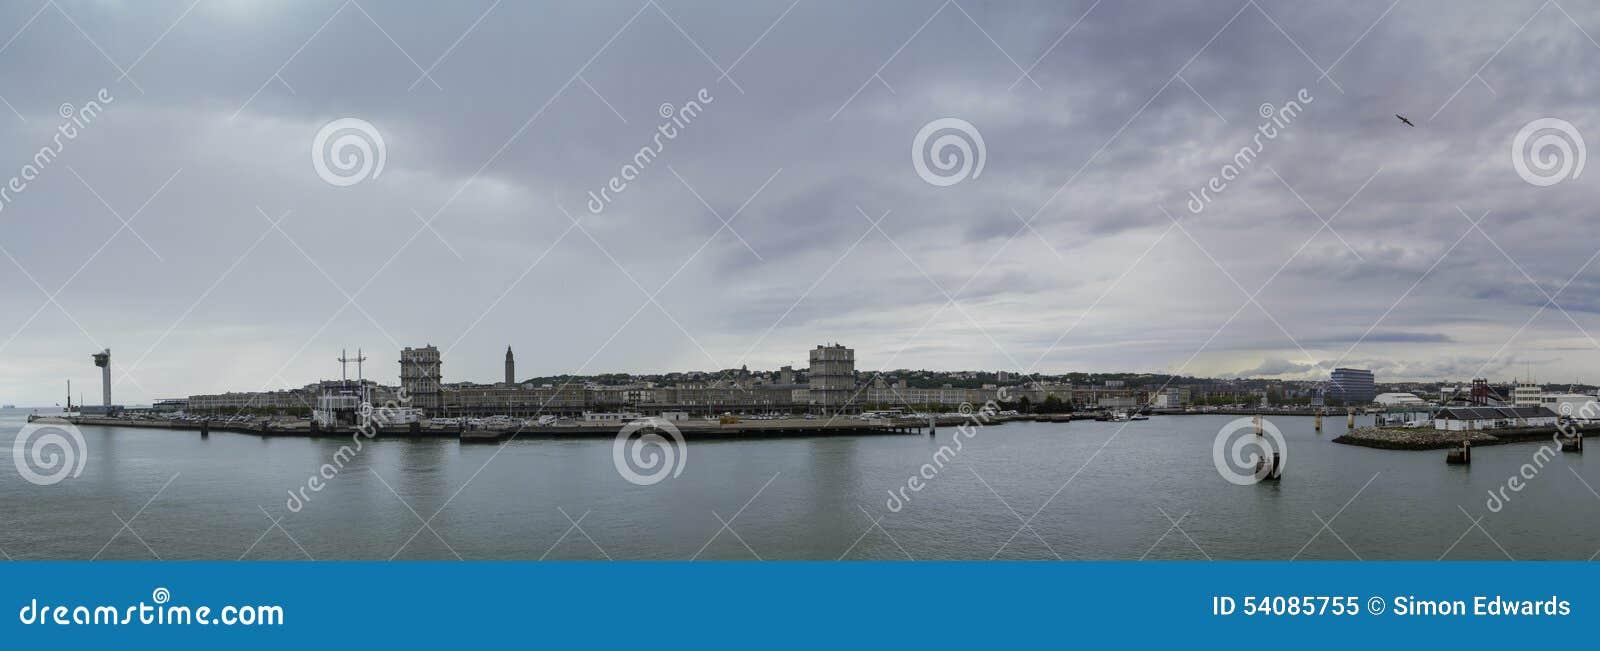 Het Panorama van Le Havre